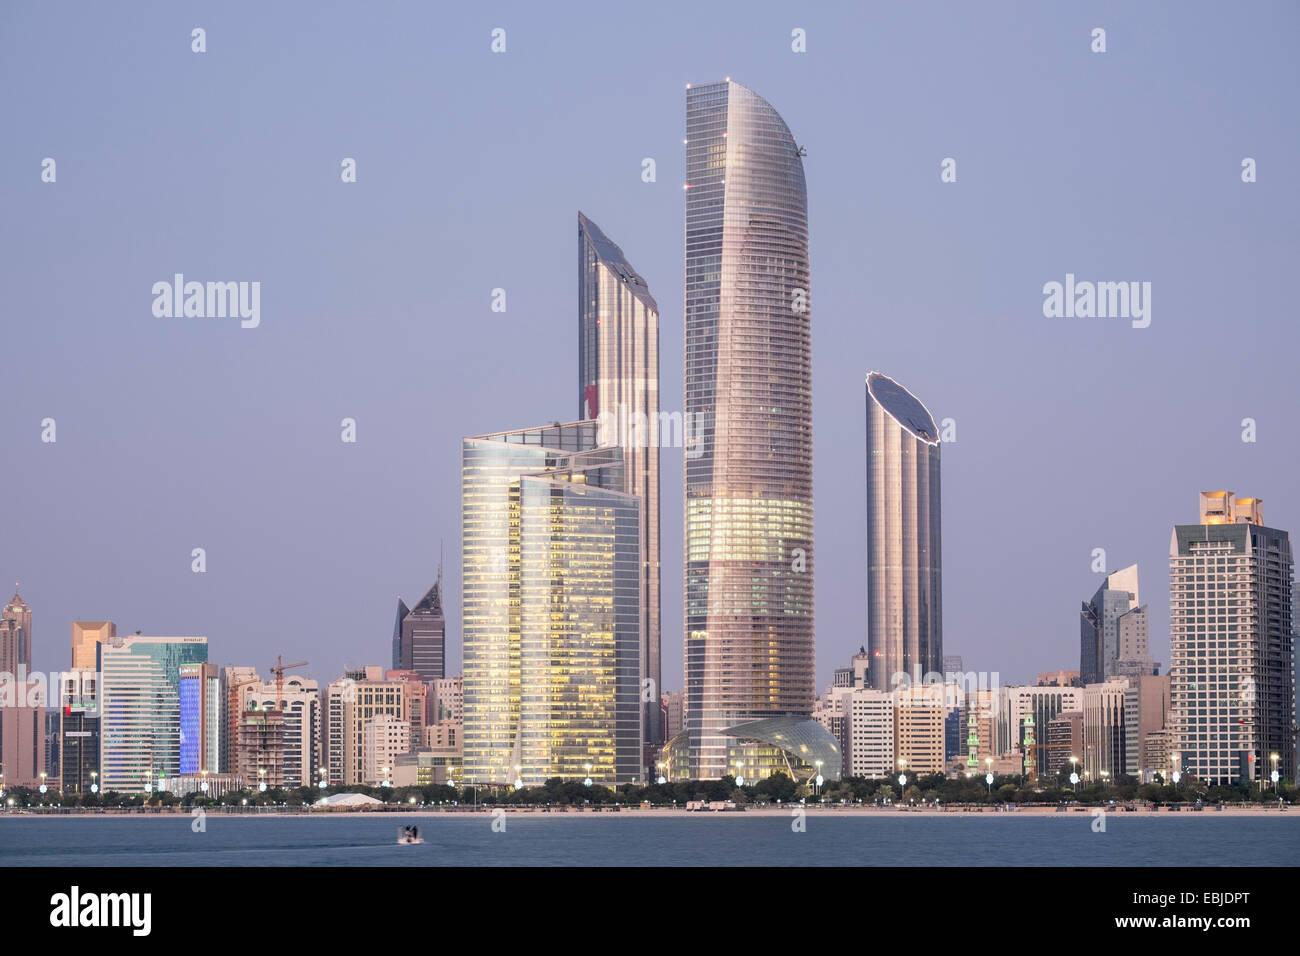 Skyline of modern buildings along Corniche waterfront in Abu Dhabi United Arab Emirates - Stock Image